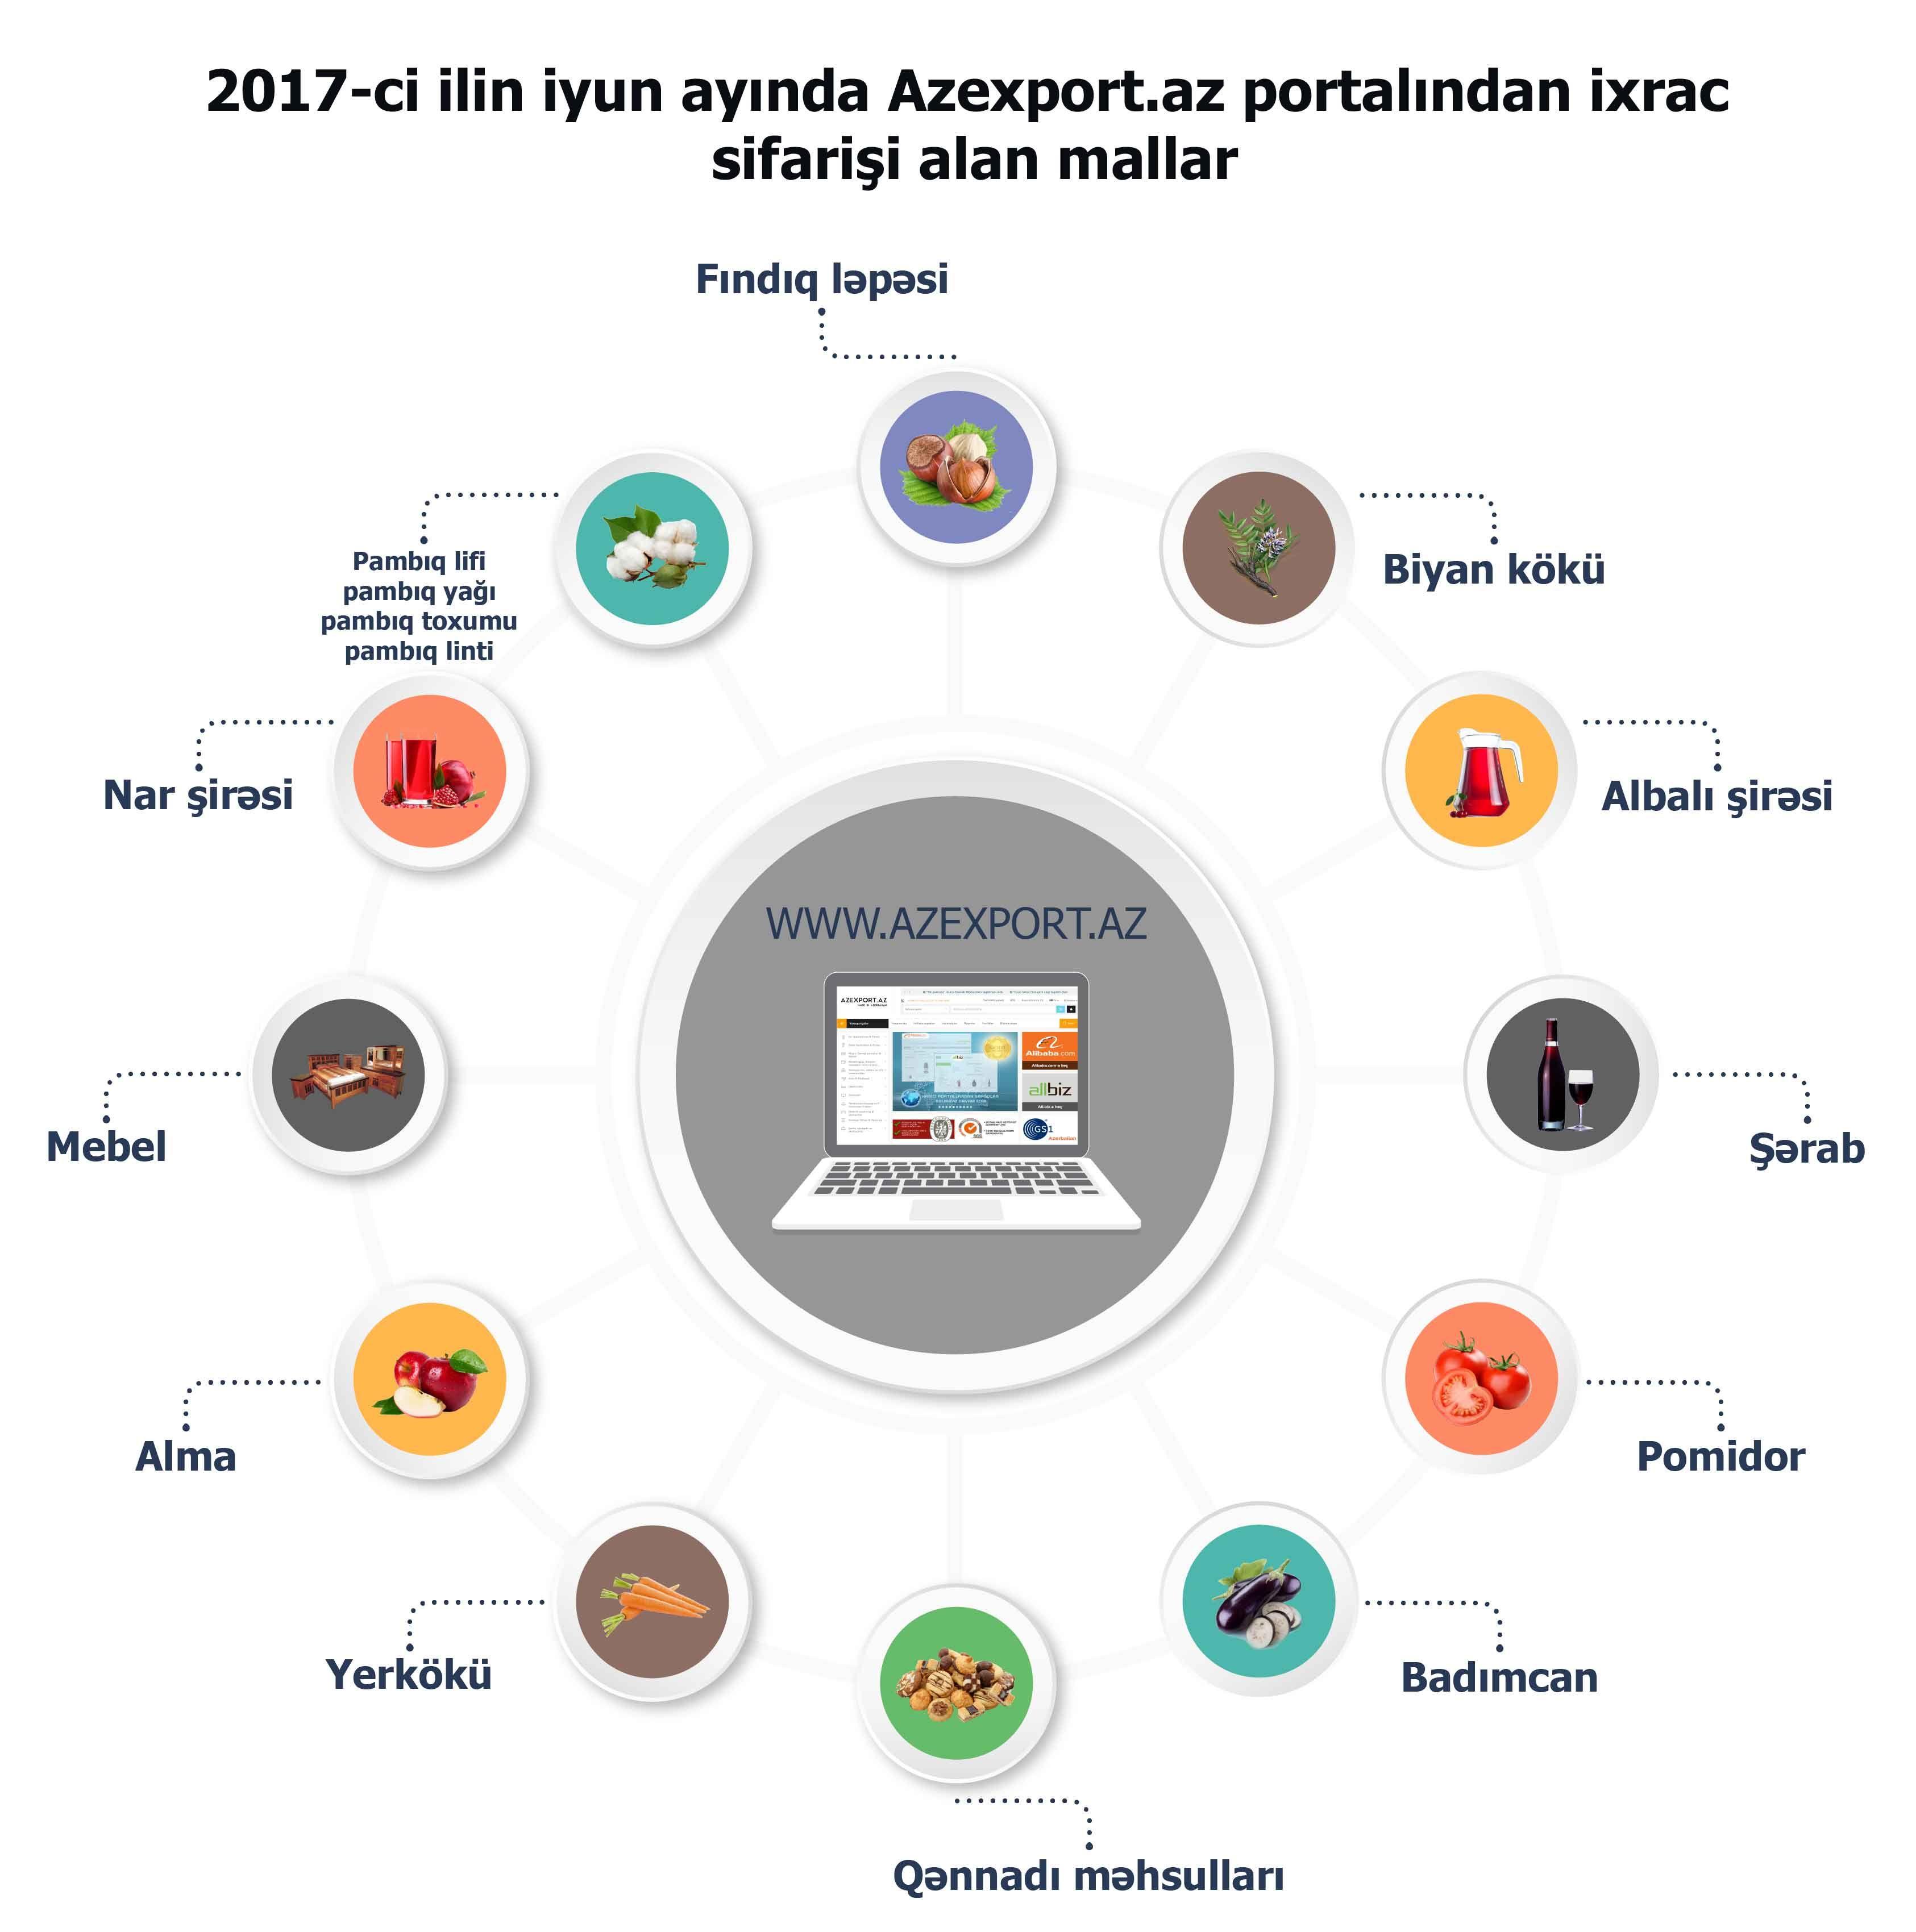 Pin By Center For Analysis Of Economi On 2017 Ci Ilin 6 Ayinda Qeyri Neft Sektoru Uzrə 5 əsas Ixrac Olkəsi Digital Marketing Channels Digital Marketing Marketing Channel